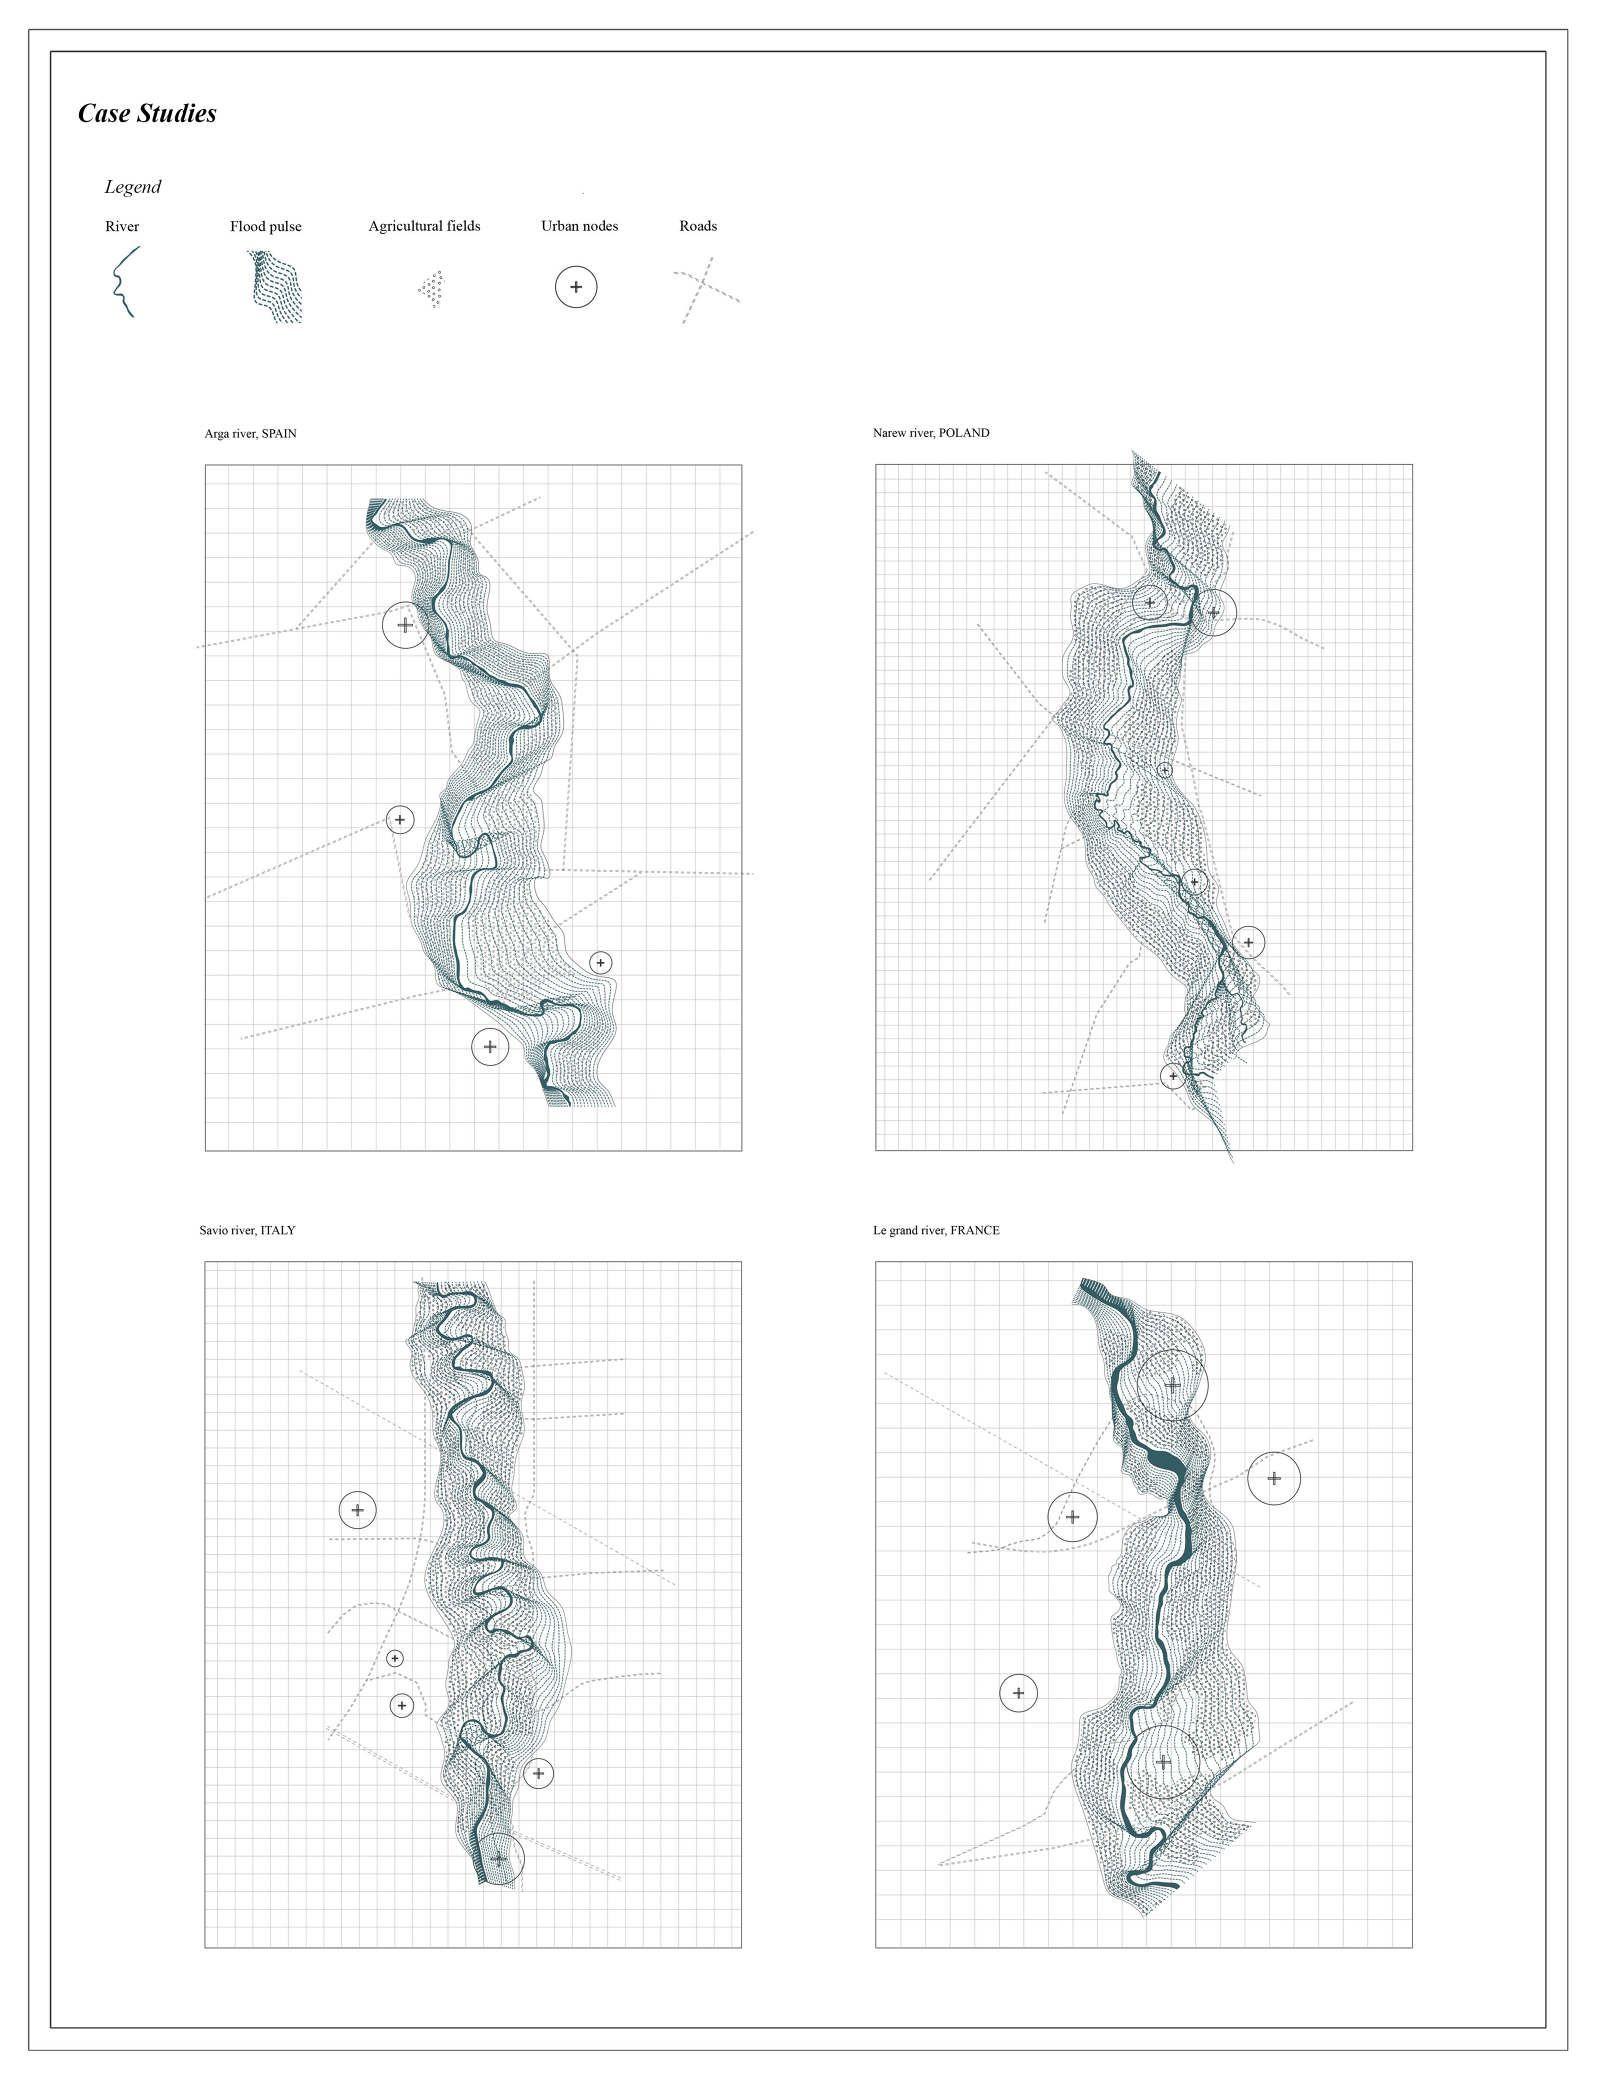 Flooding Mechanisms Bra Driva Amp Ribot